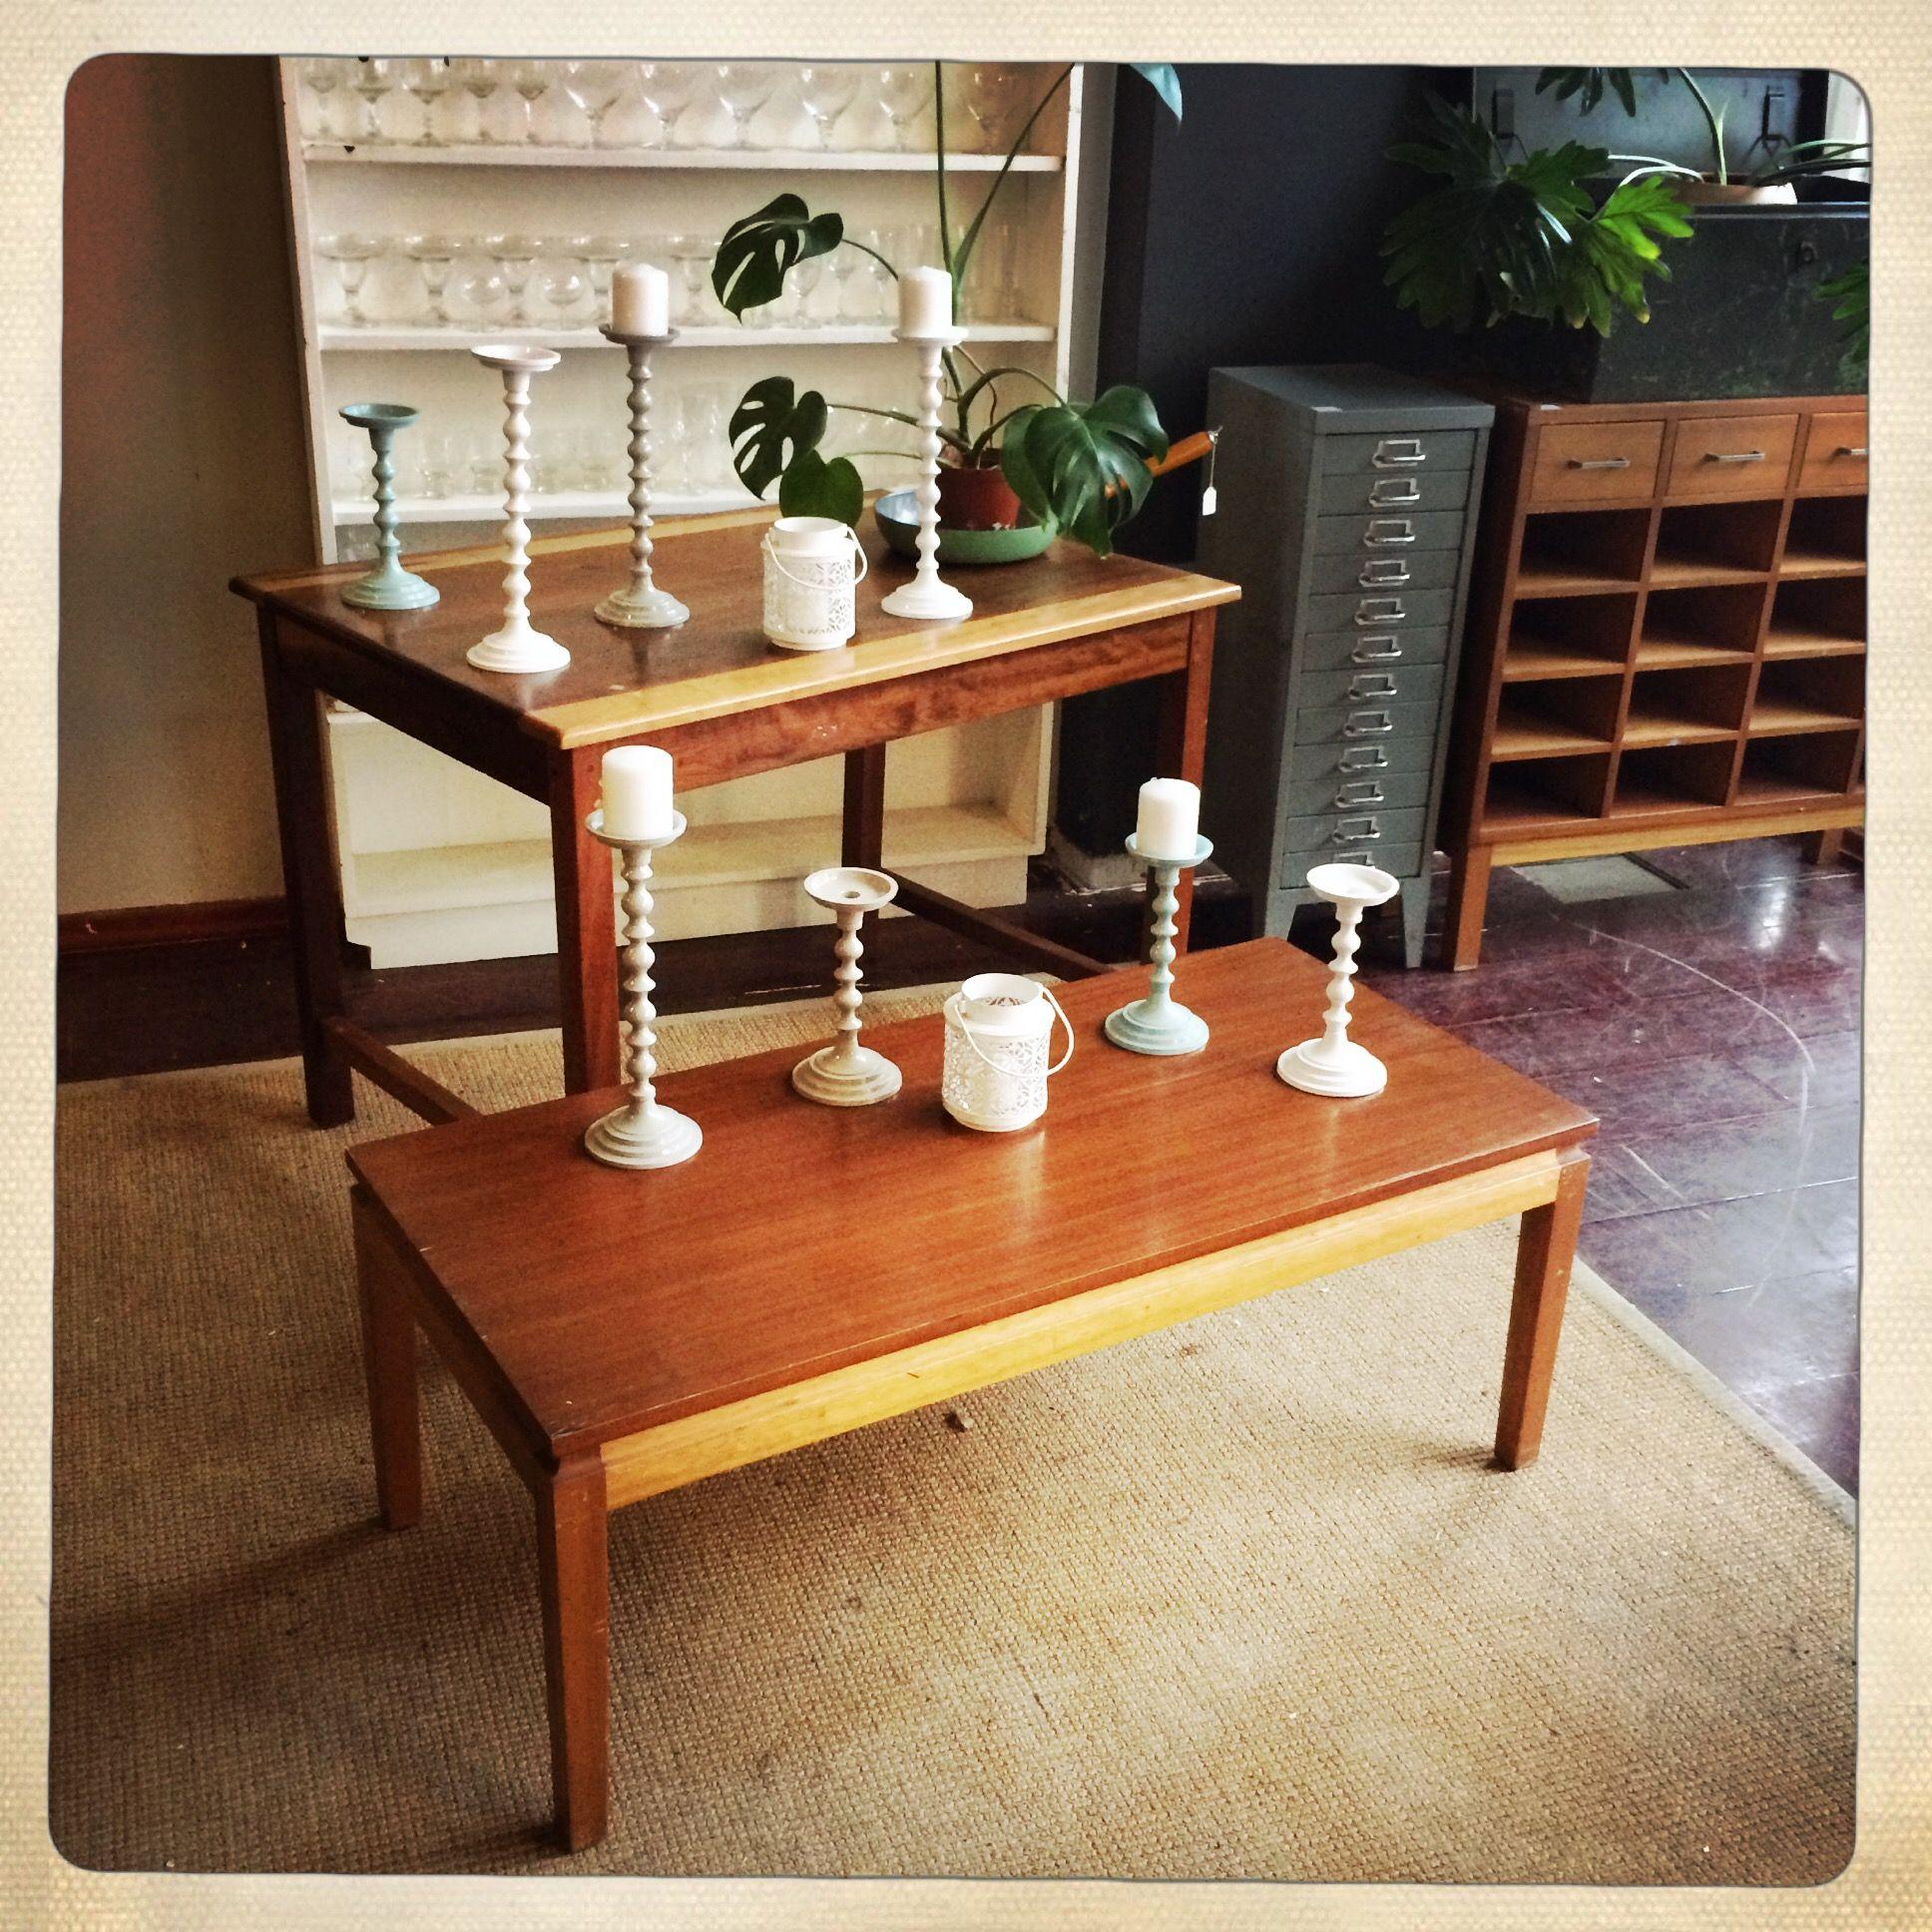 Coffee Table Candlesticks In 2020 Coffee Table Decor Furniture [ 1936 x 1936 Pixel ]